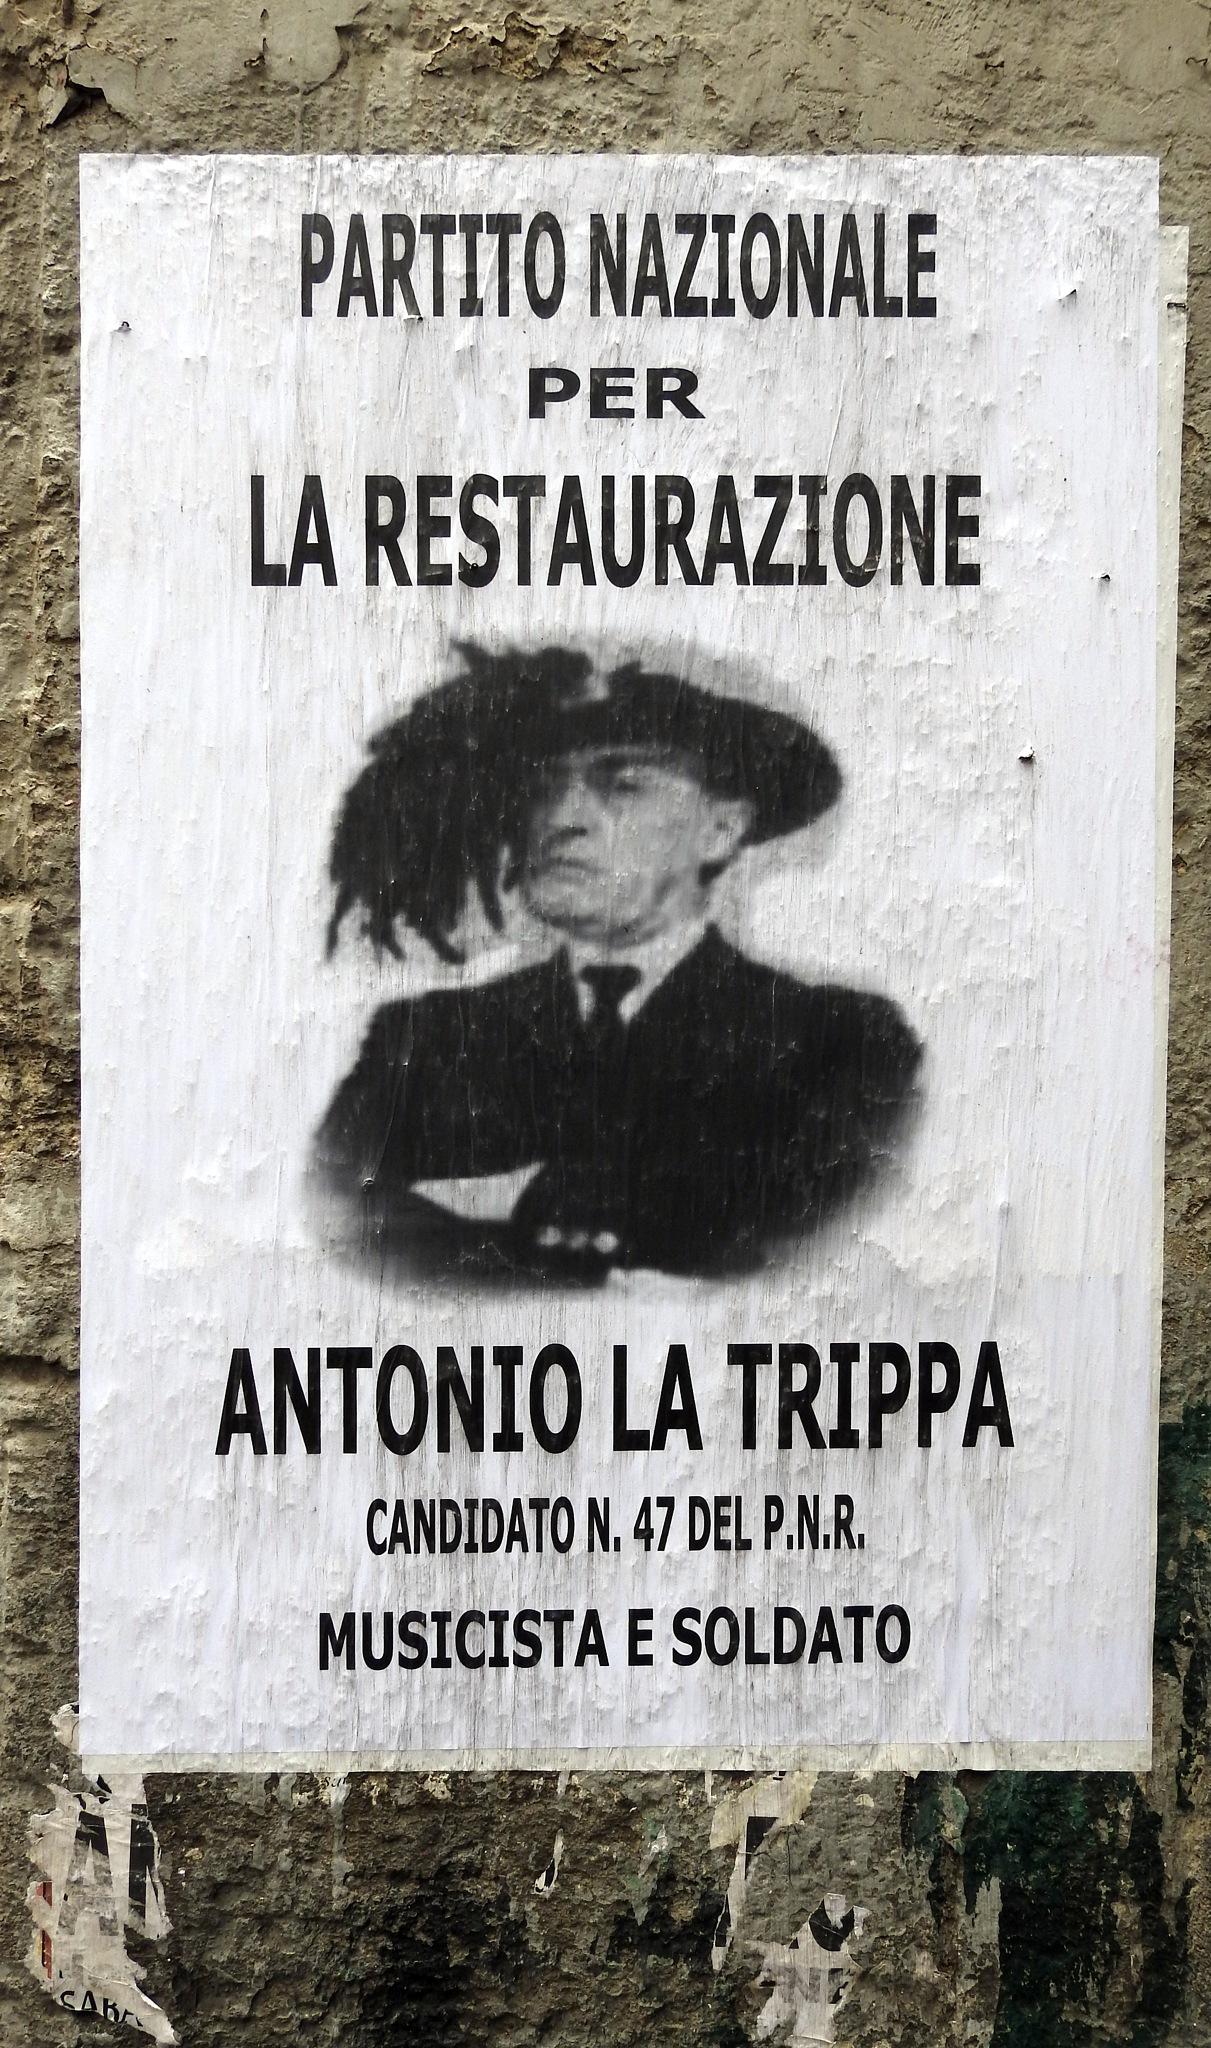 Naples - Street Art - Massimiliano Mantice Project - Italian Movie - Totò           by Arnaldo De Lisio